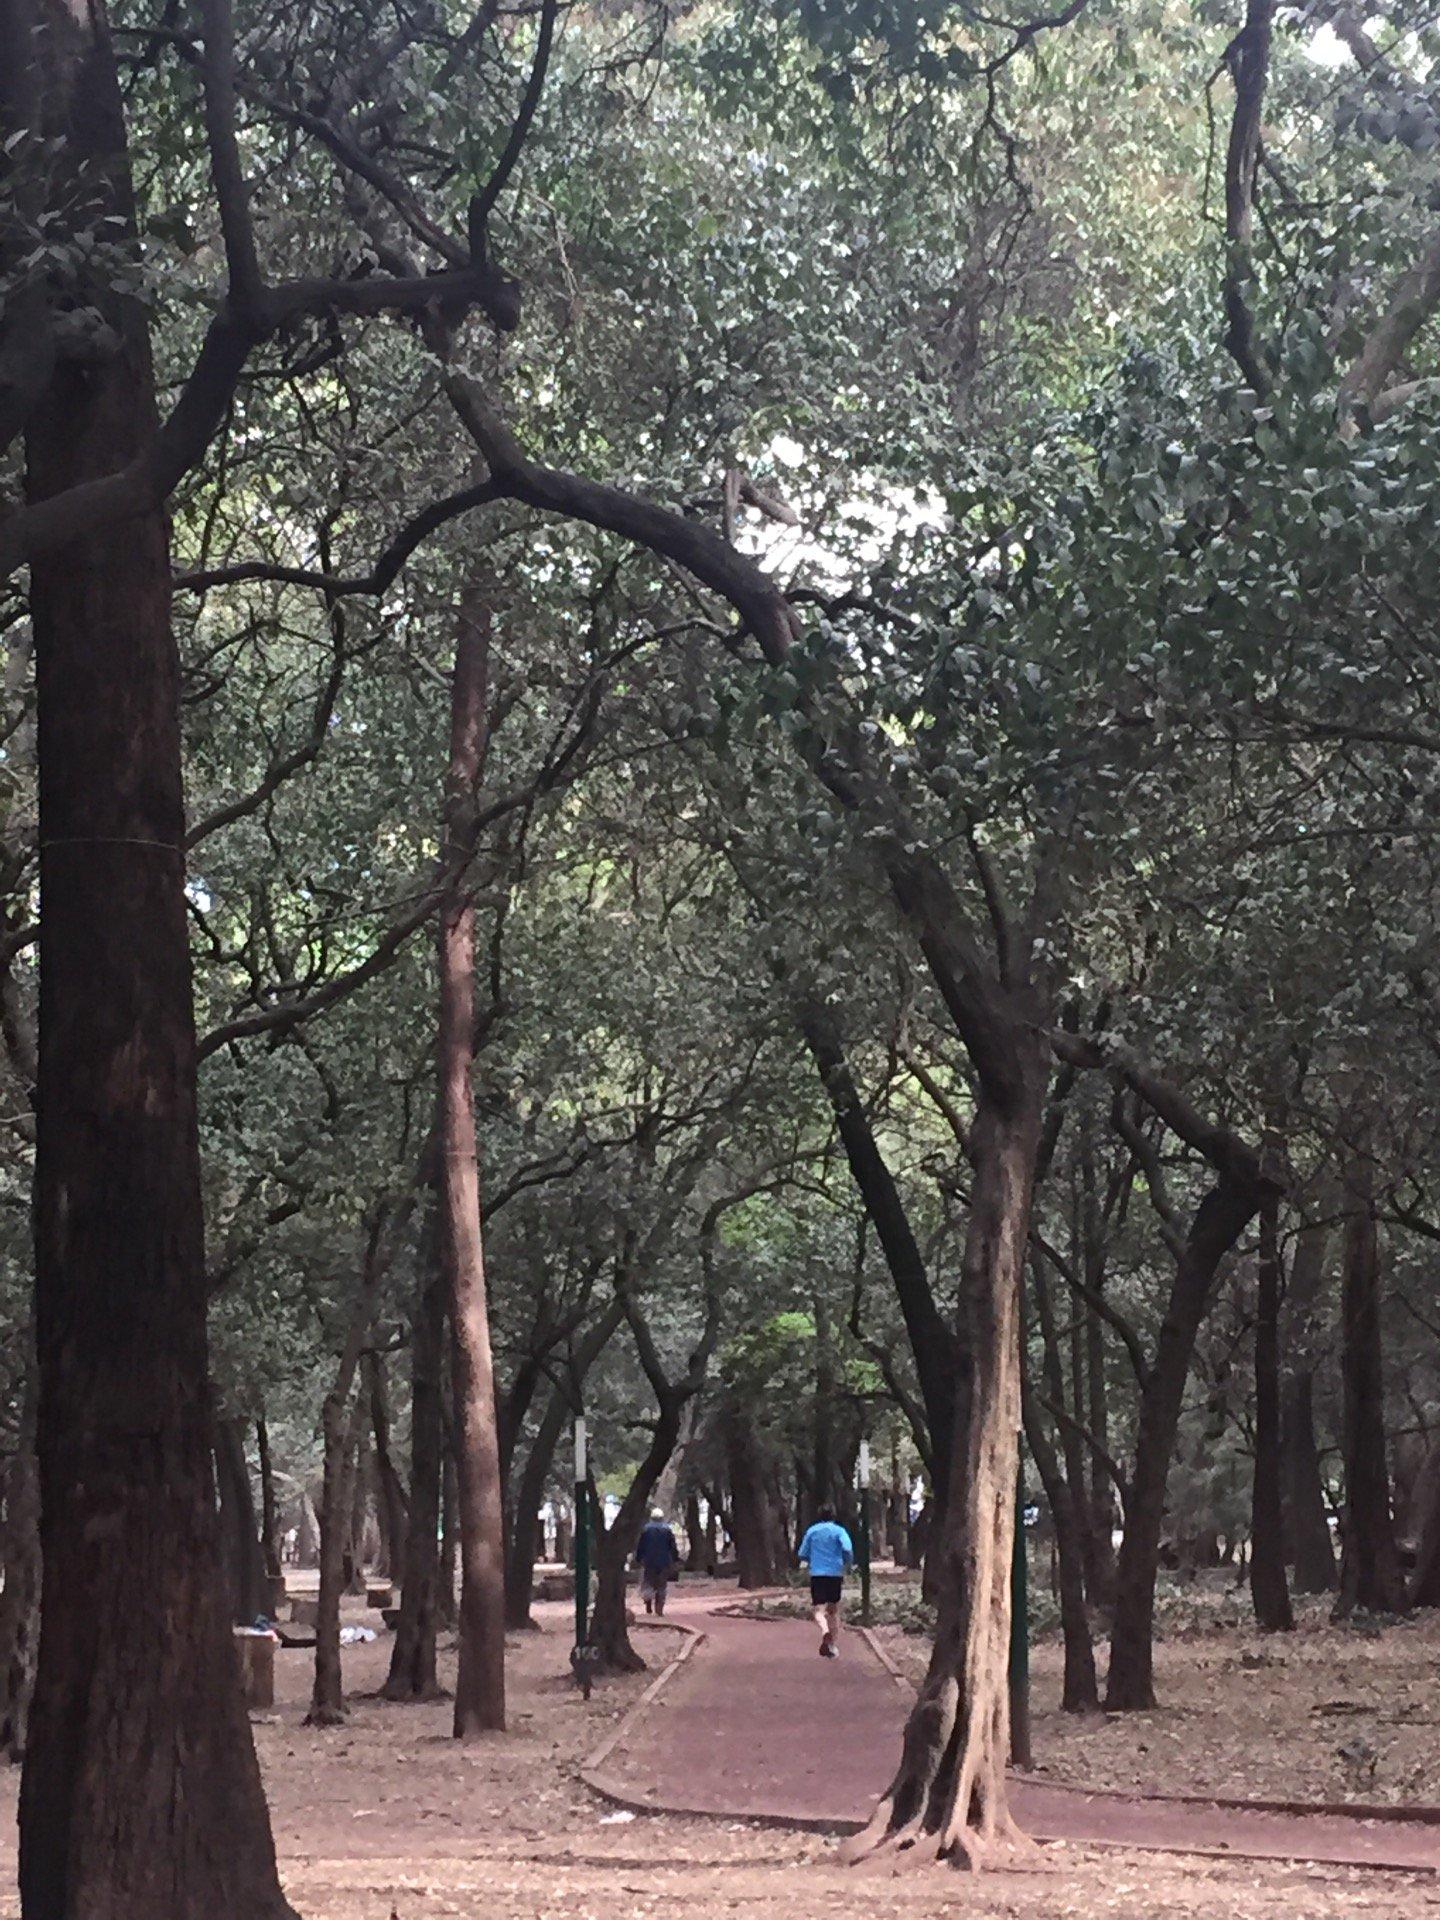 Circuito Gandhi : Melatetete : @ circuito gandhi corredores https: t